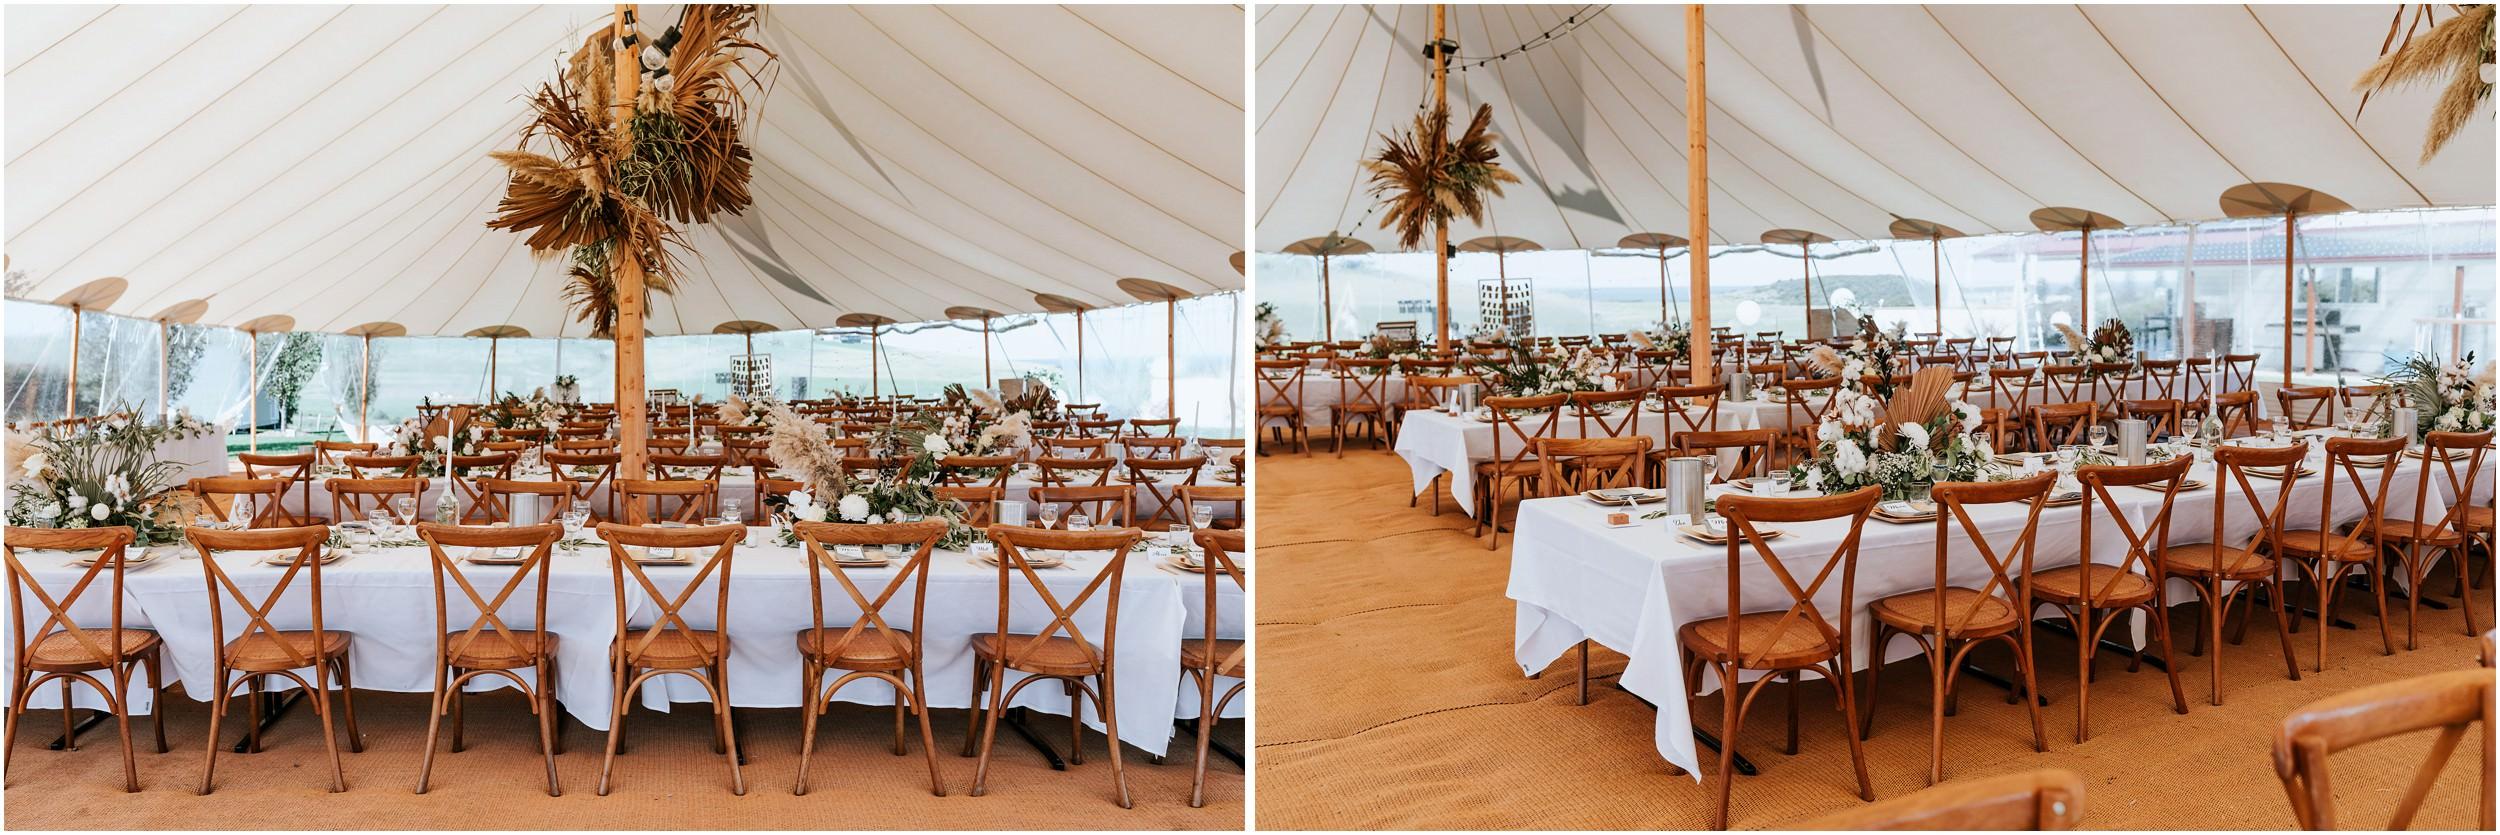 wedding_seacliff_house_alanah_keiran_0040.jpg